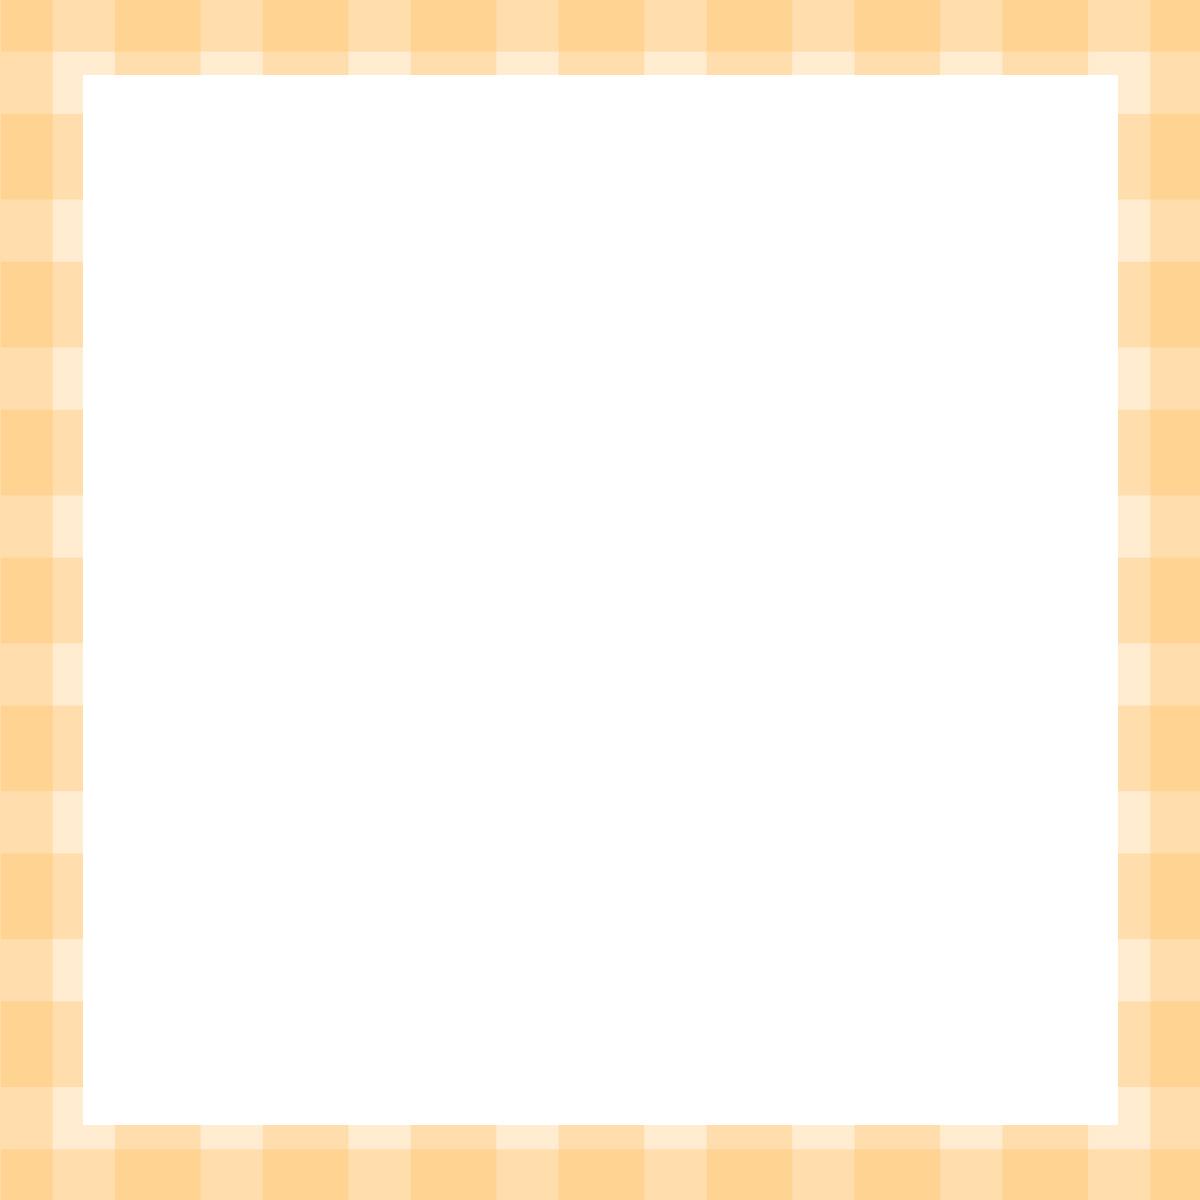 【Instagram用】黄色チェックの背景フレームのイラスト